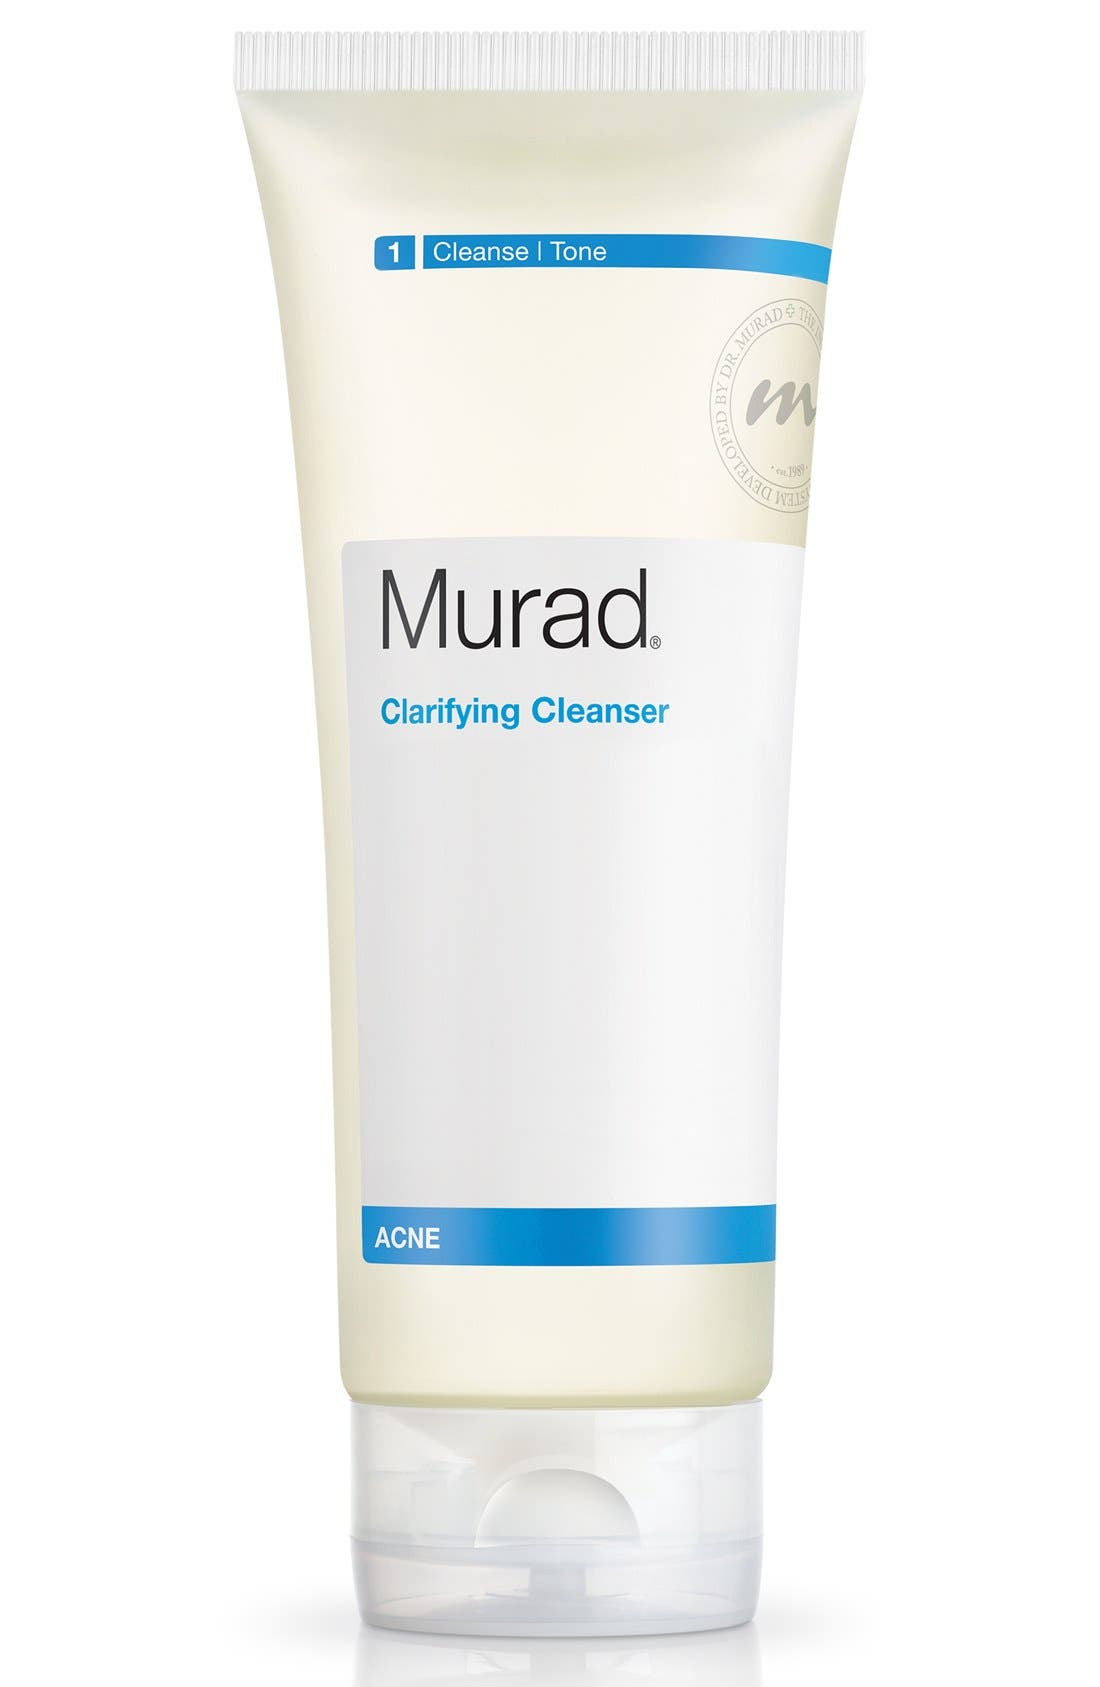 Murad® Clarifying Cleanser